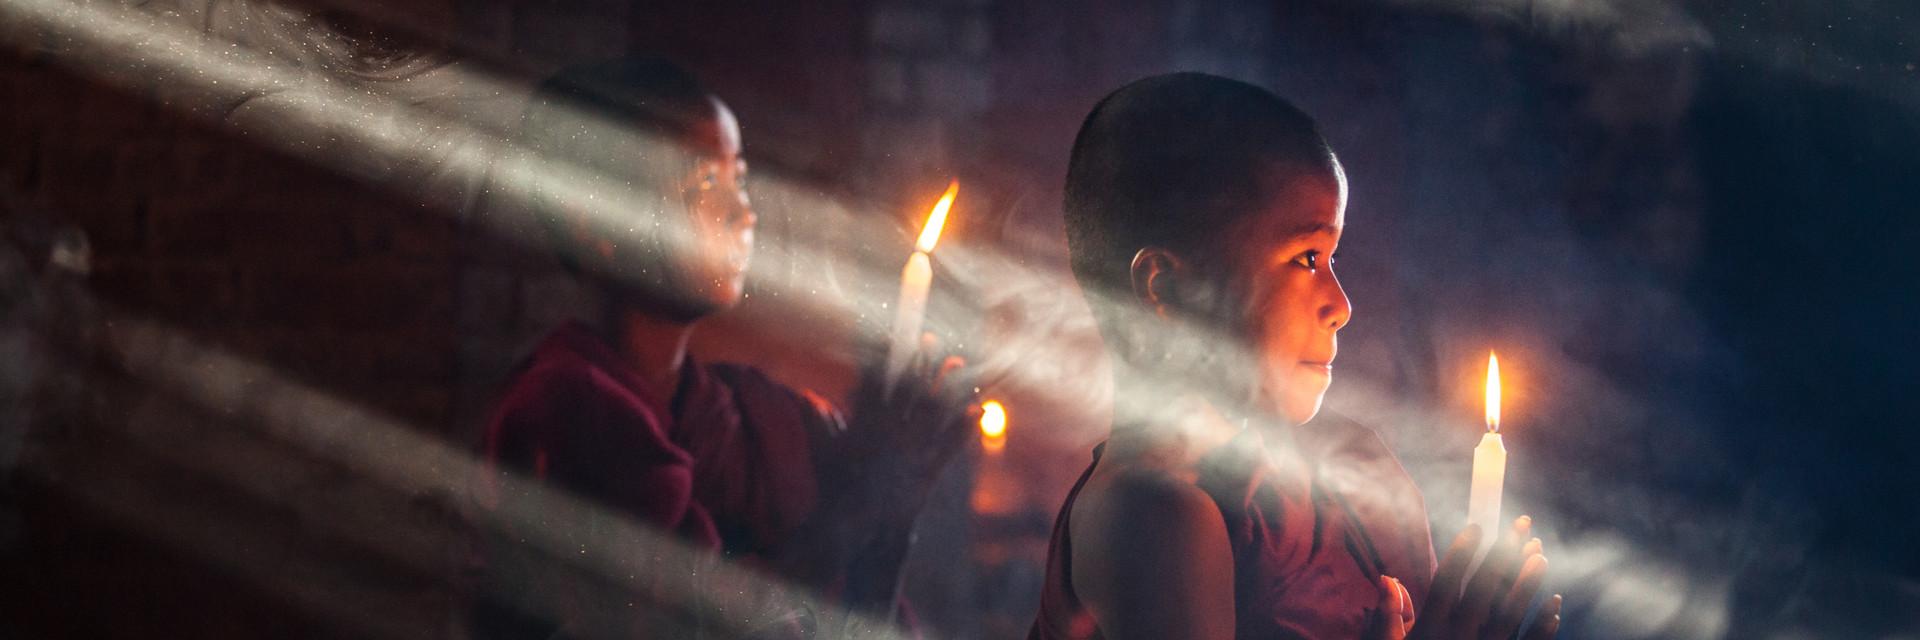 Myanmar buddhist